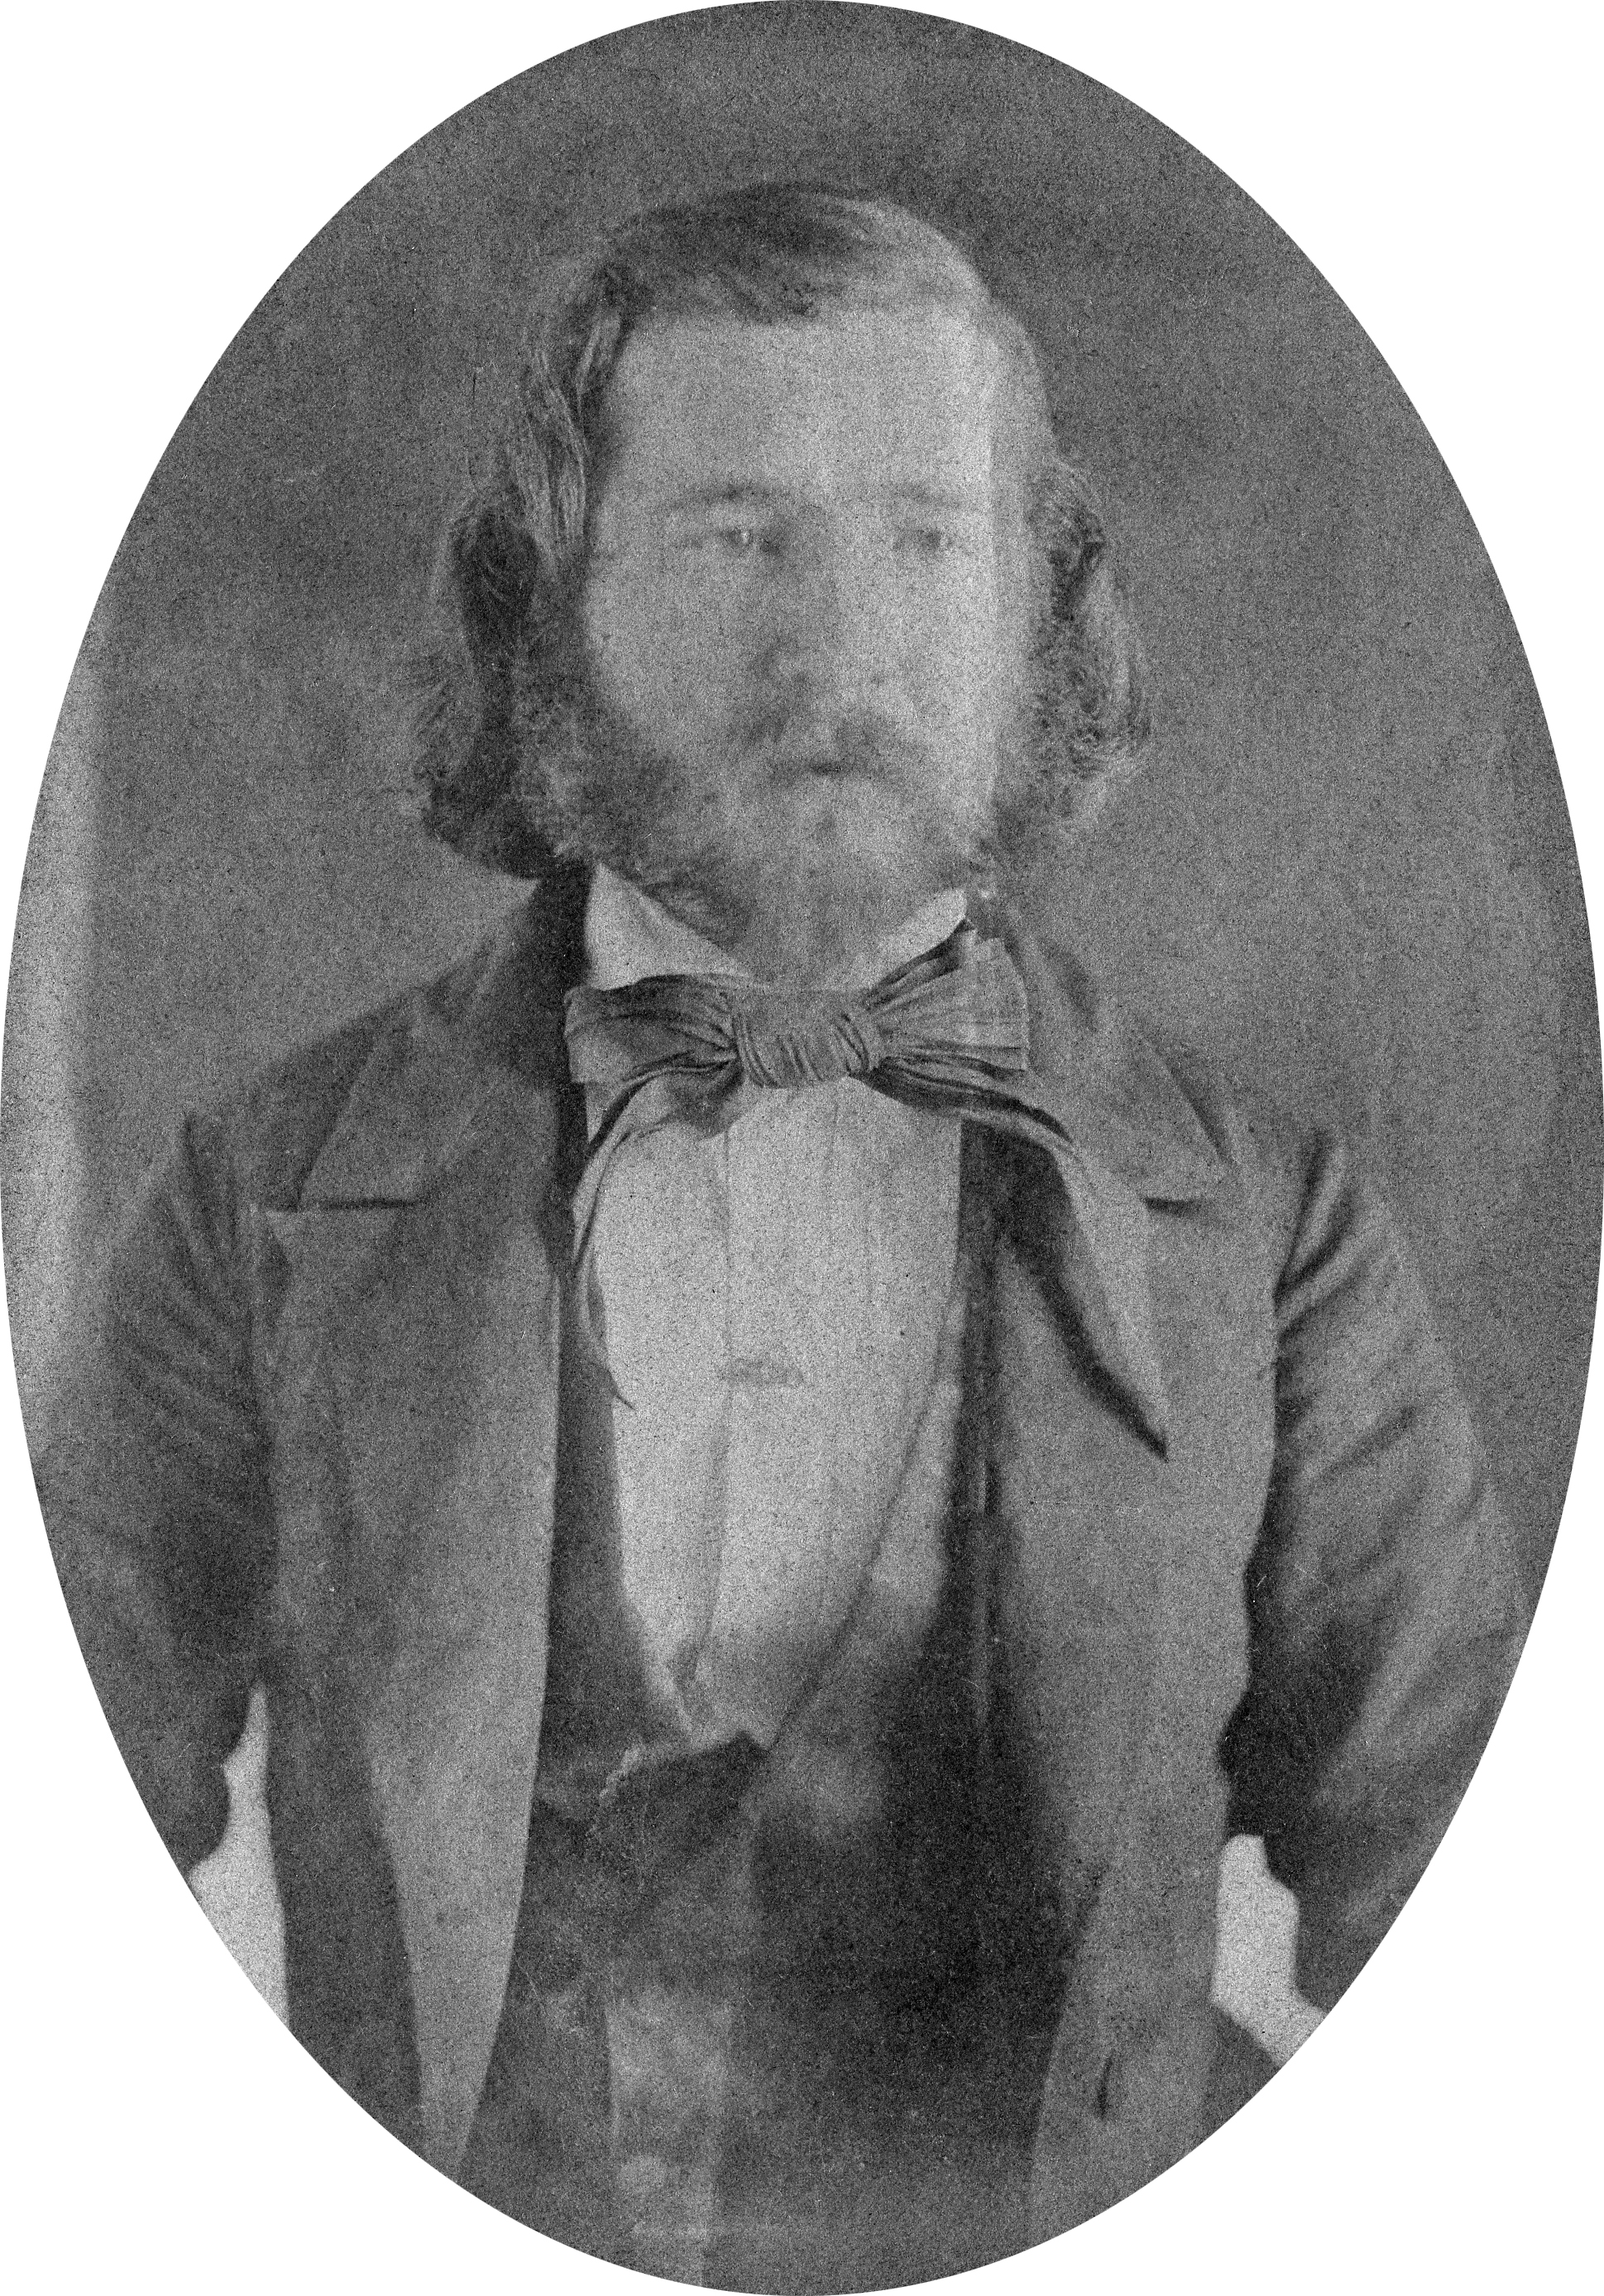 Image of Samuel C. Mills from Wikidata